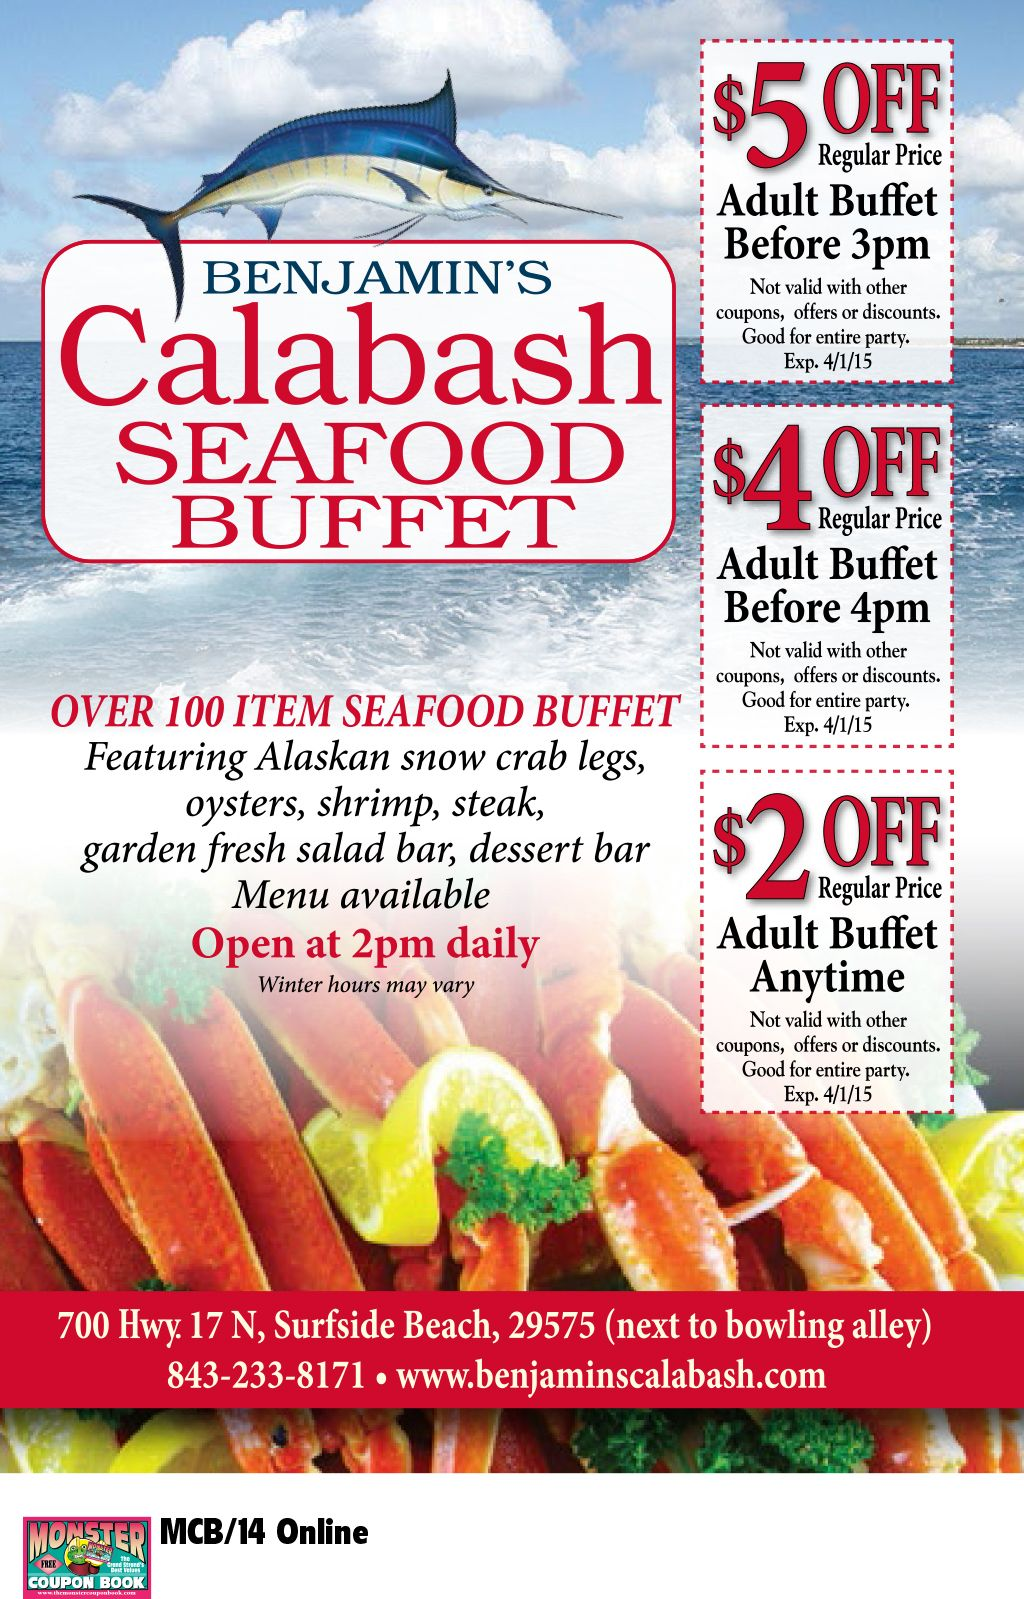 Excellent Benjamins Calabash Seafood Buffet Myrtle Beach Resorts Best Image Libraries Barepthycampuscom